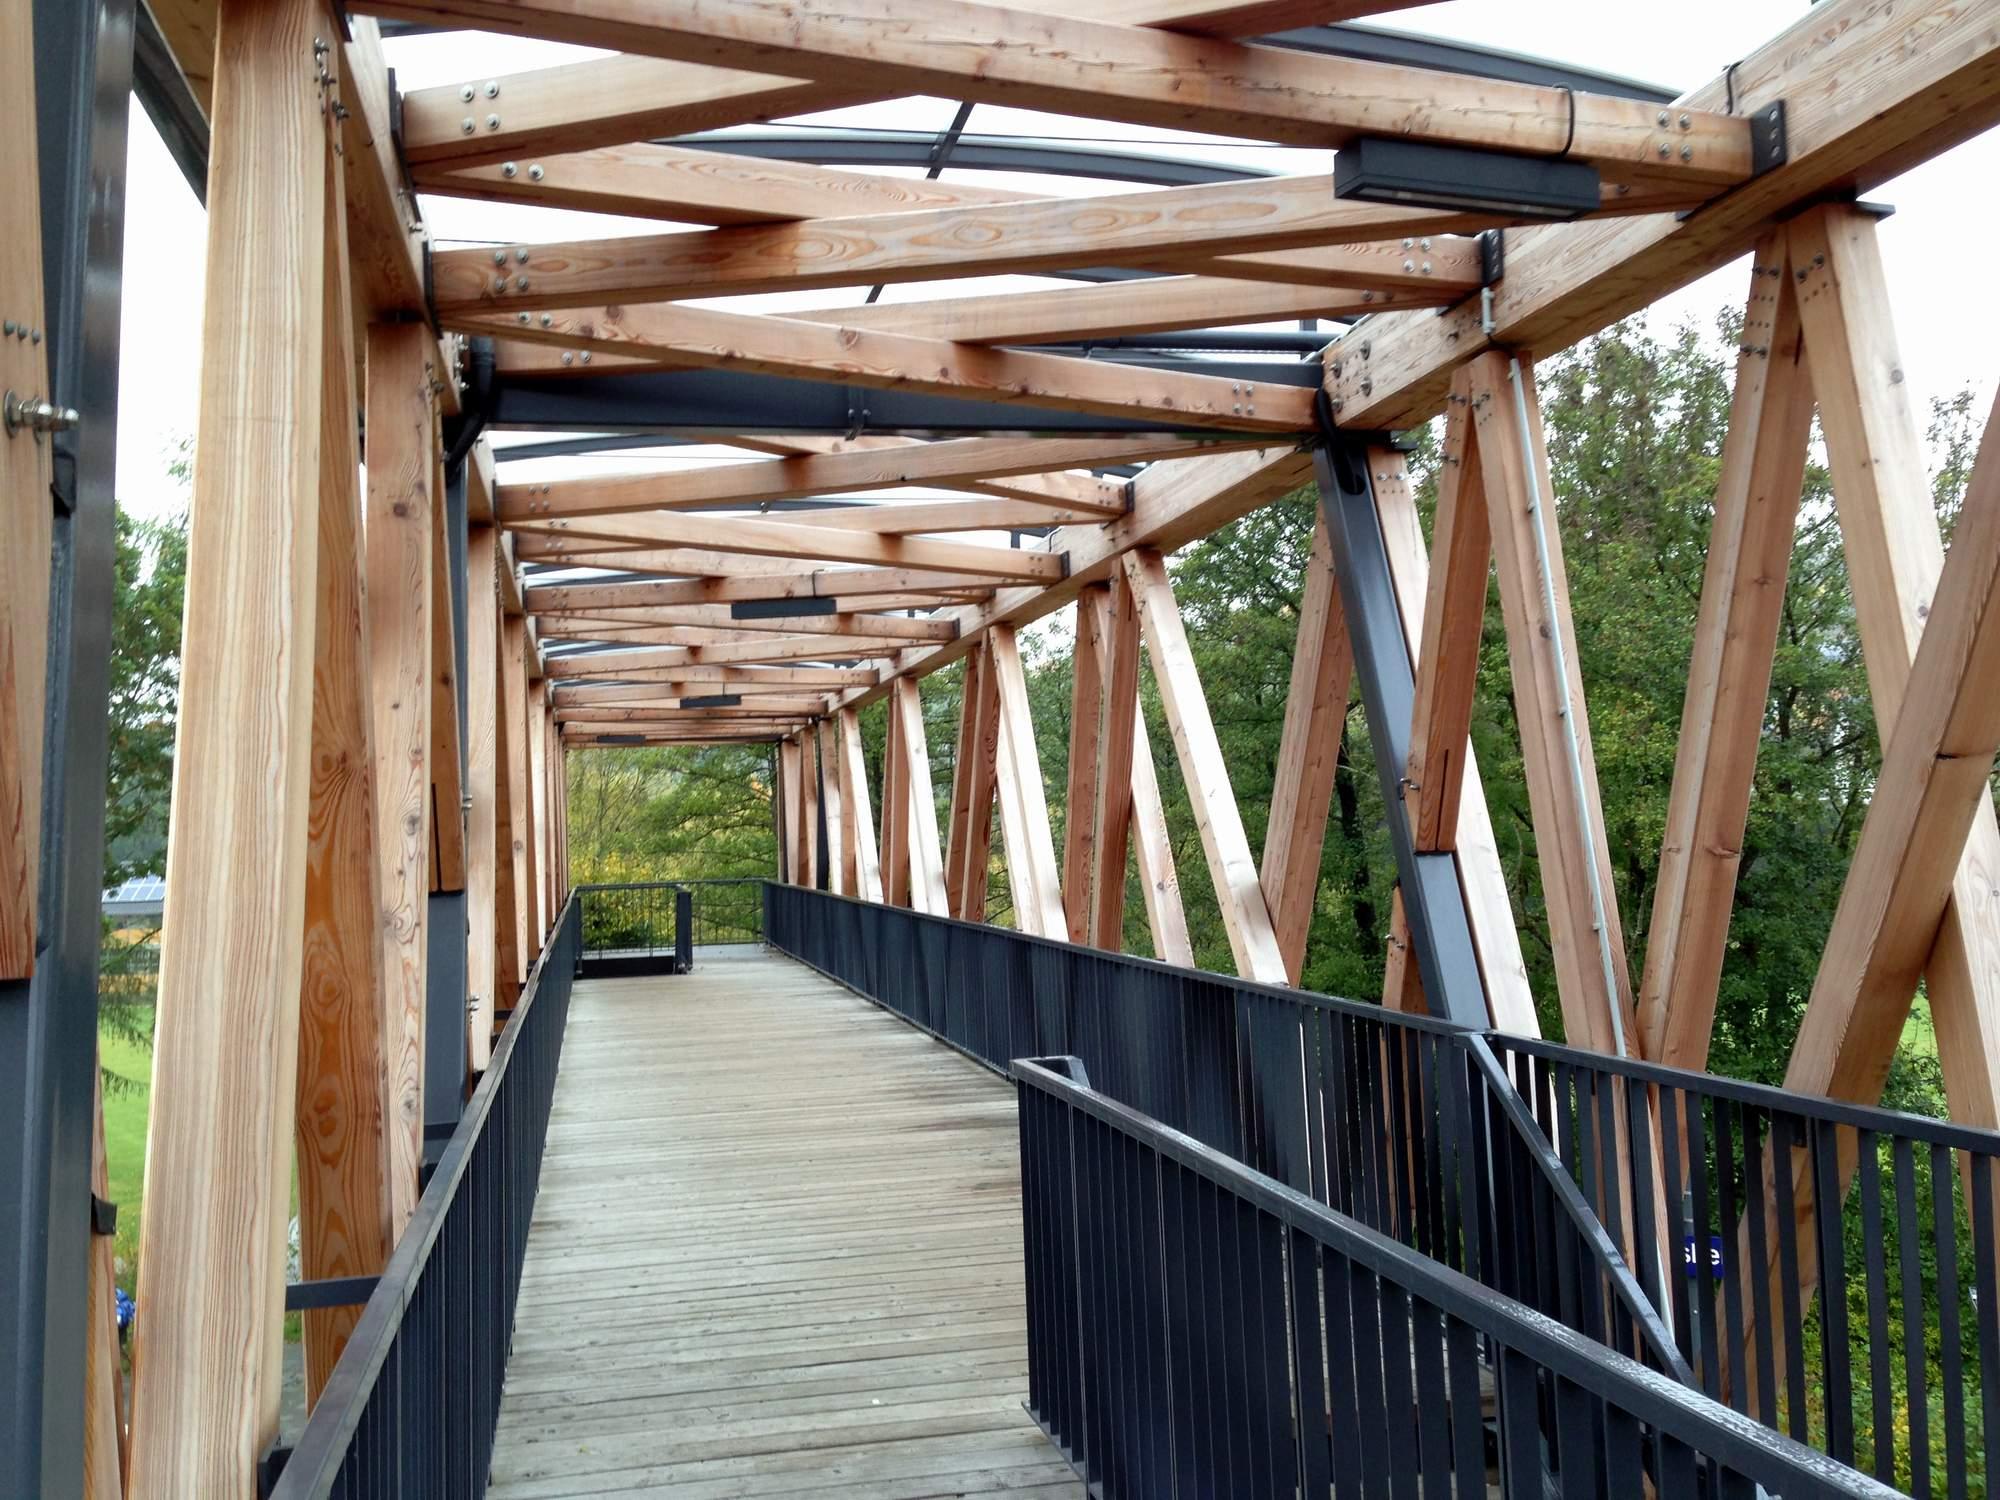 Bahn bergang aus holz arch blog for Fachwerkkonstruktion stahl